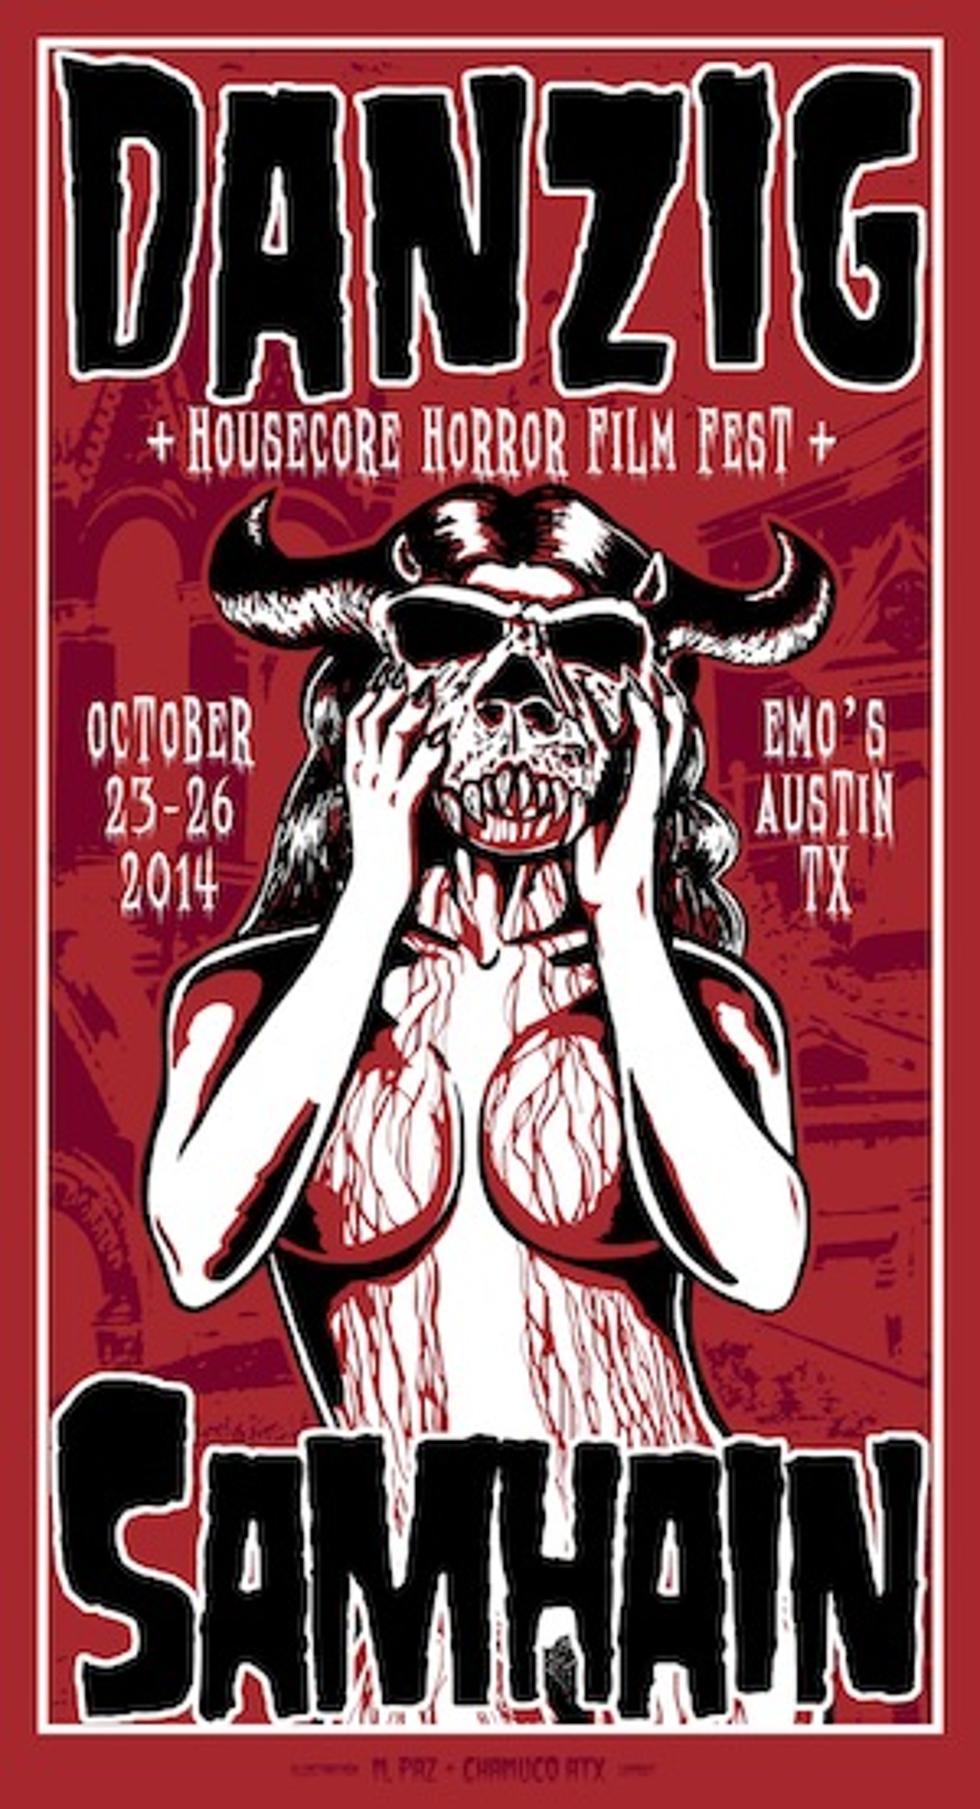 Danzig, Samhain Lead 2014 Housecore Horror Fest Additions